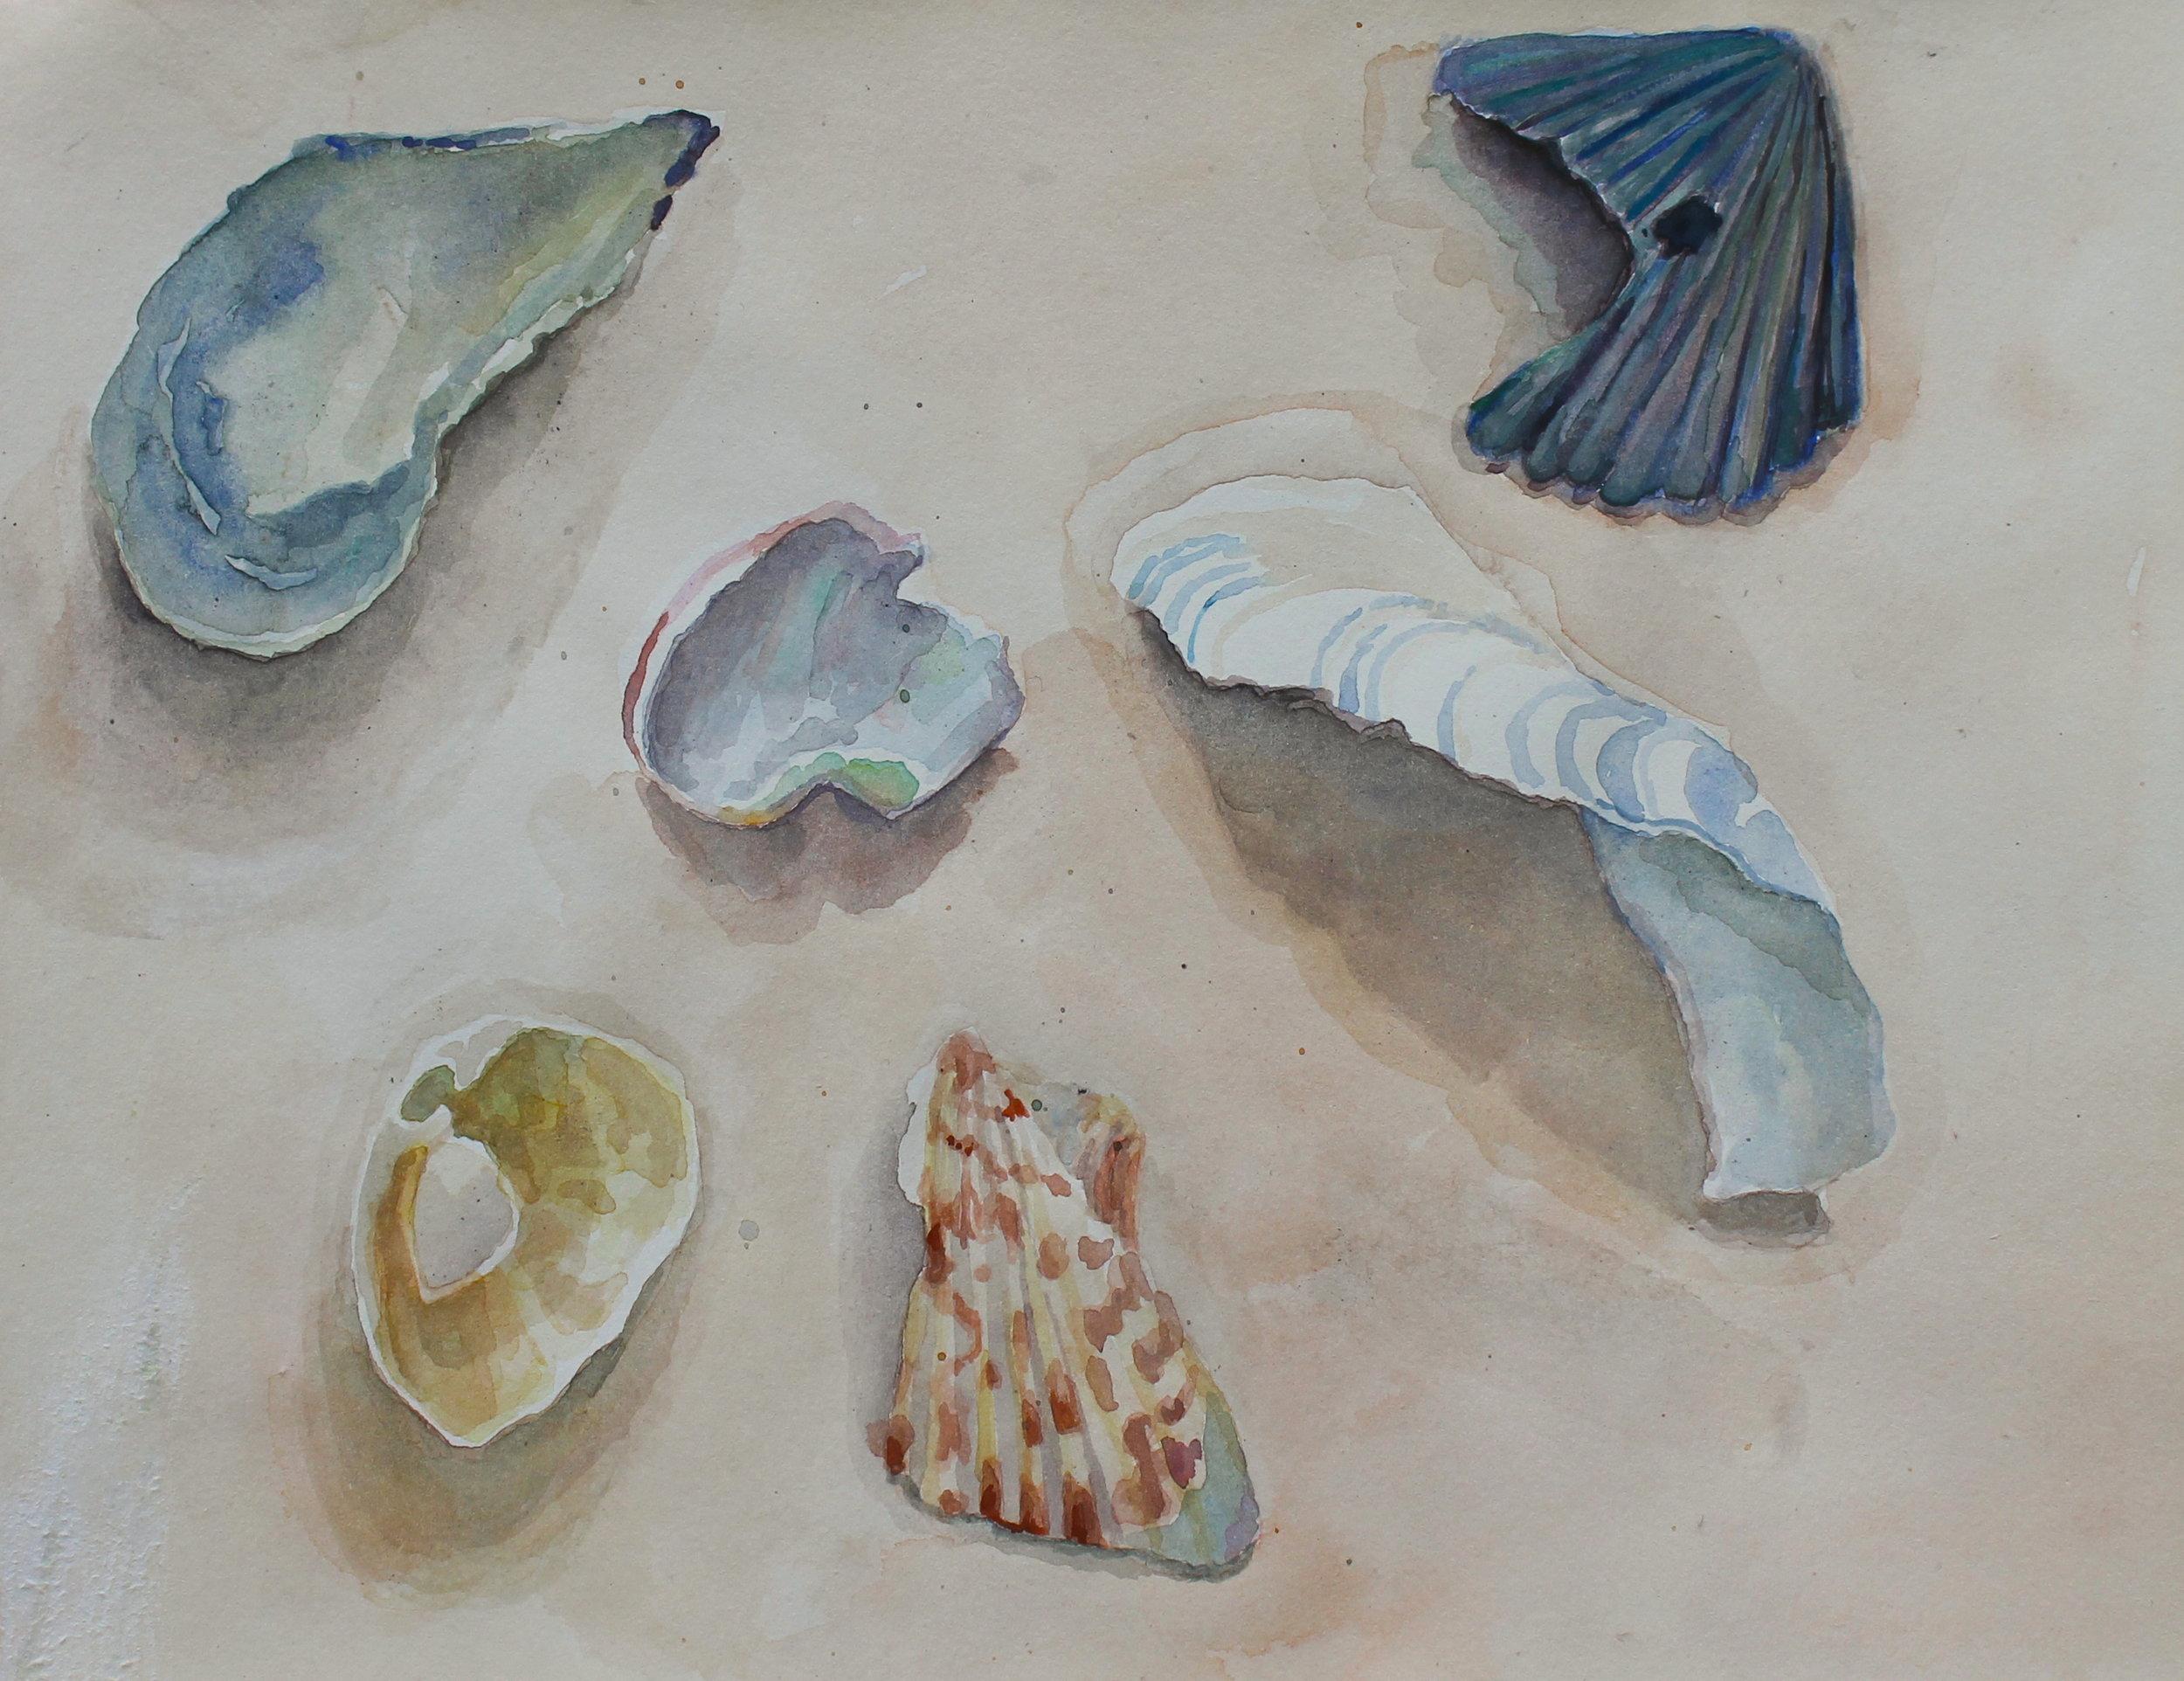 Sea shells, Watercolor, 8 x 10.5 in, 2015